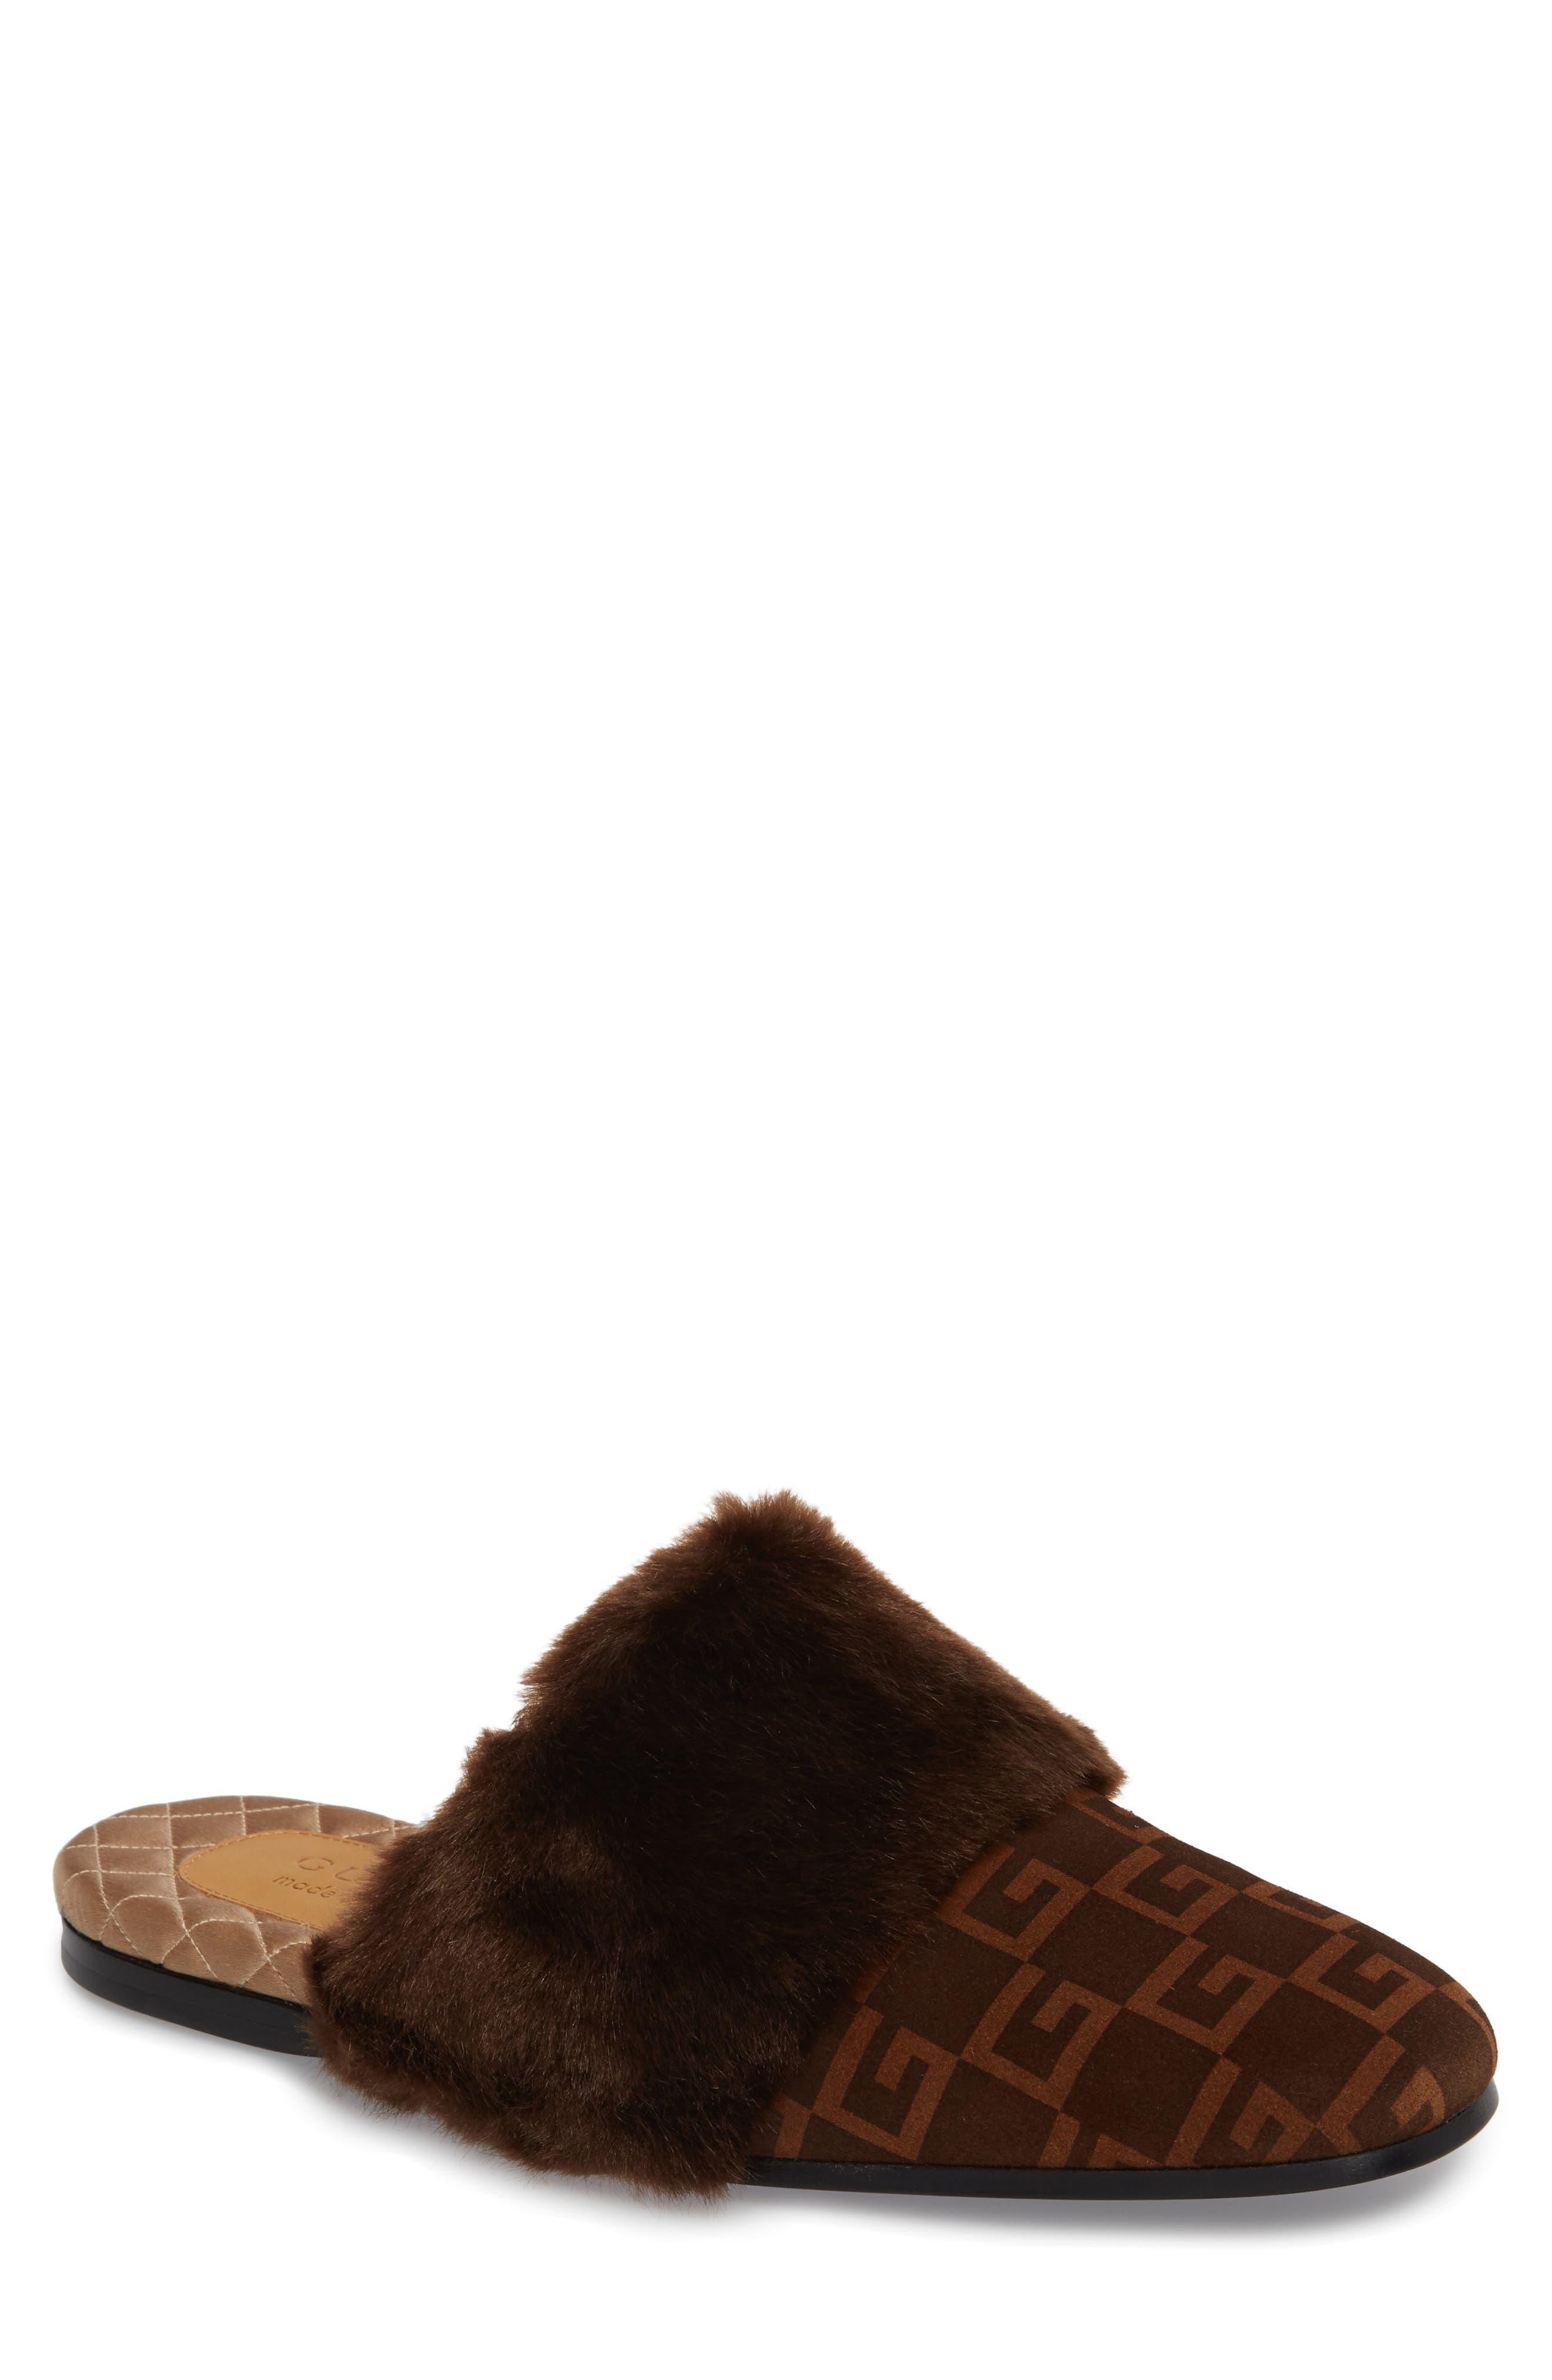 Square-G Faux Fur Slipper,                             Main thumbnail 1, color,                             BROWN/ SIGARO